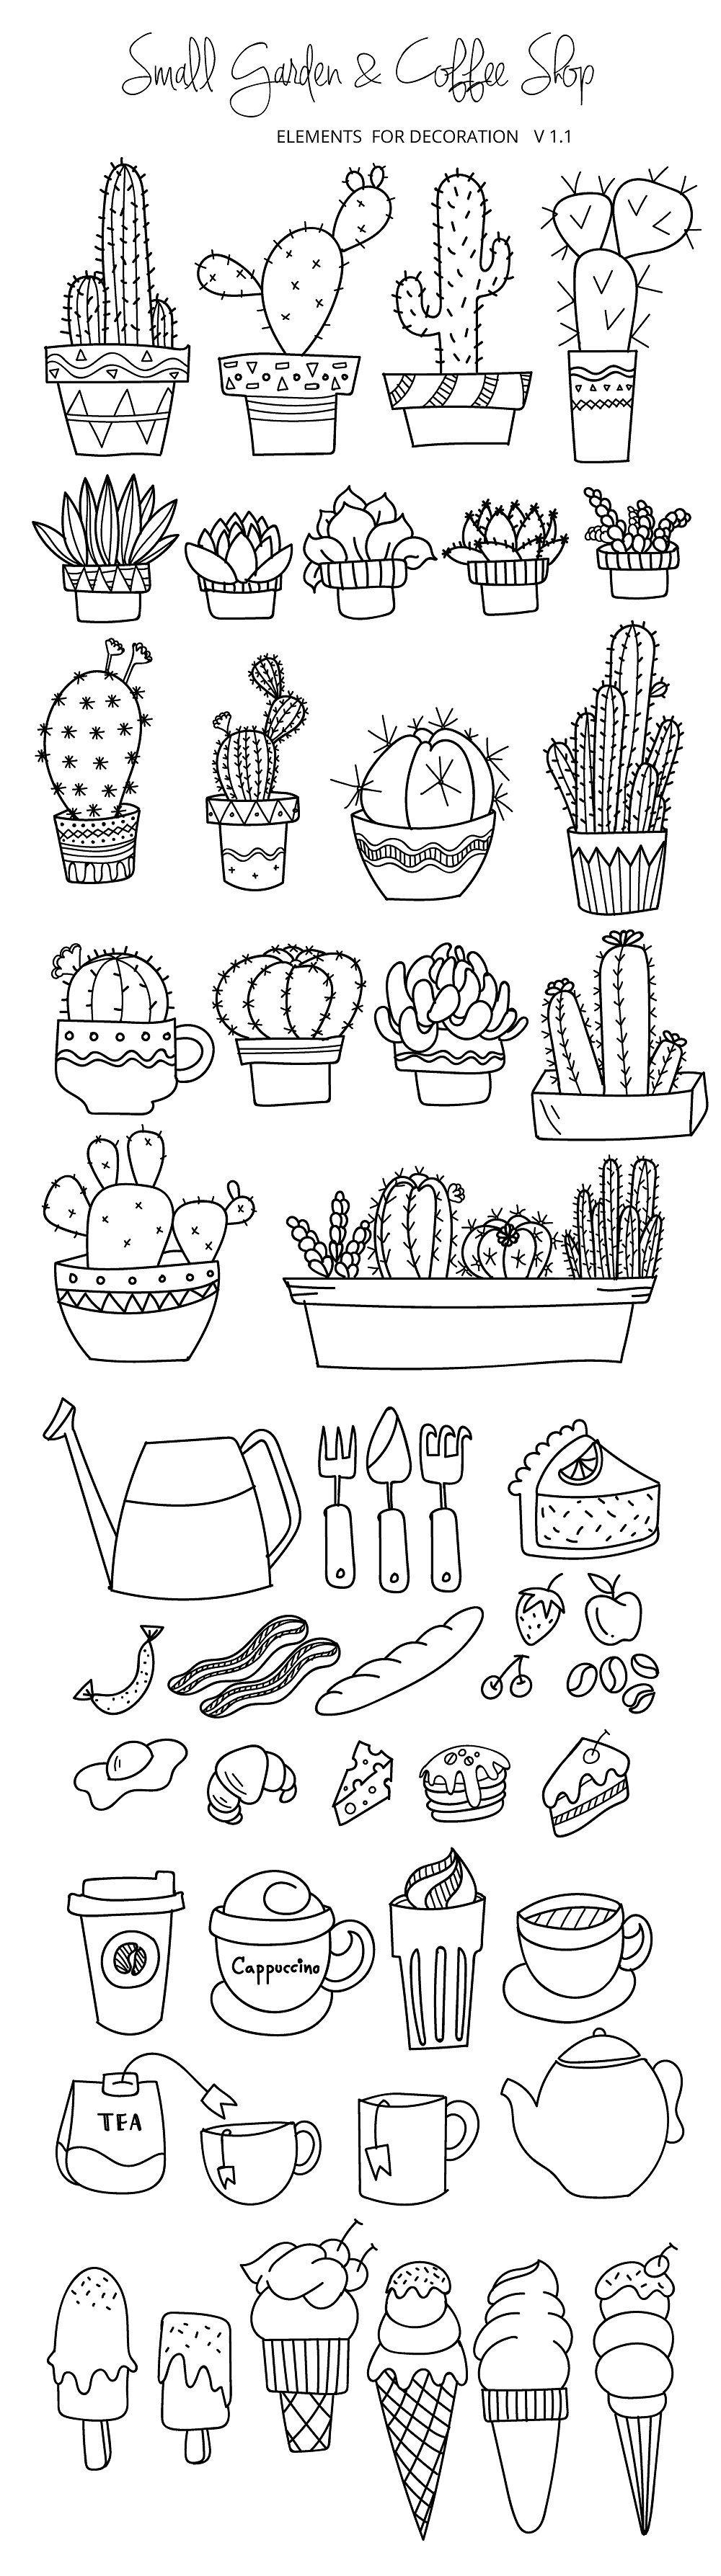 Small garden u coffee shop illustrations bullet journal